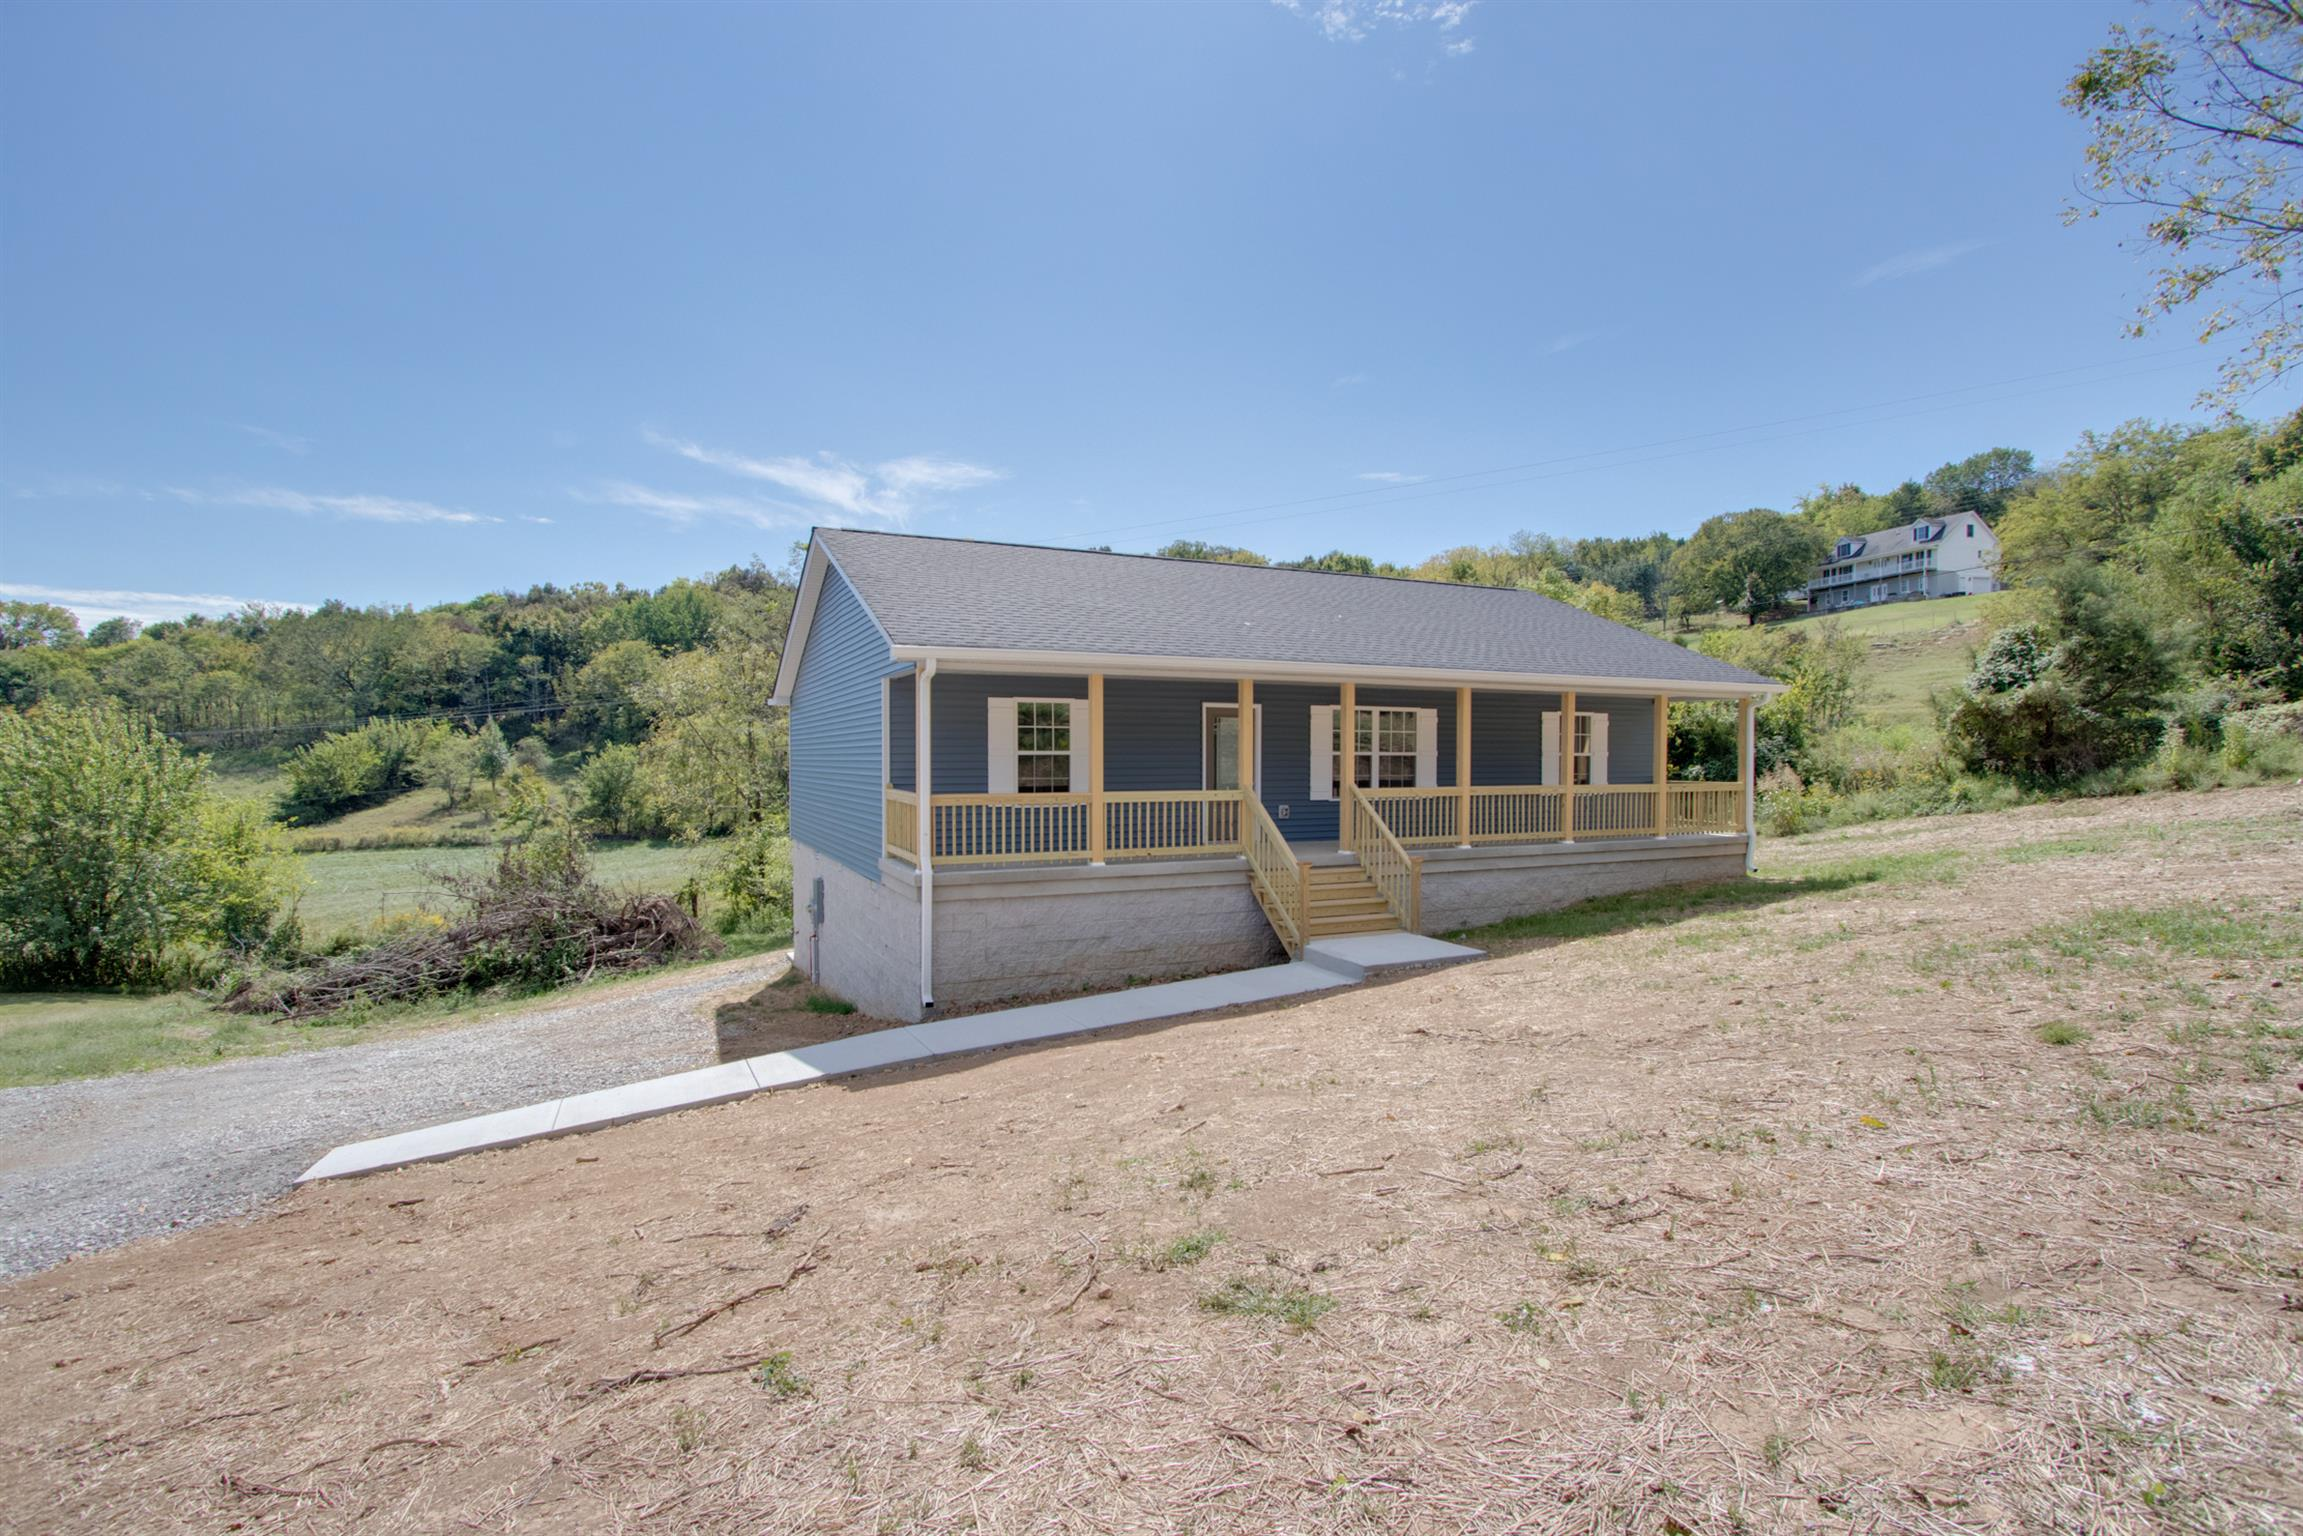 169 Ward Hollow Rd, Brush Creek, TN 38547 - Brush Creek, TN real estate listing